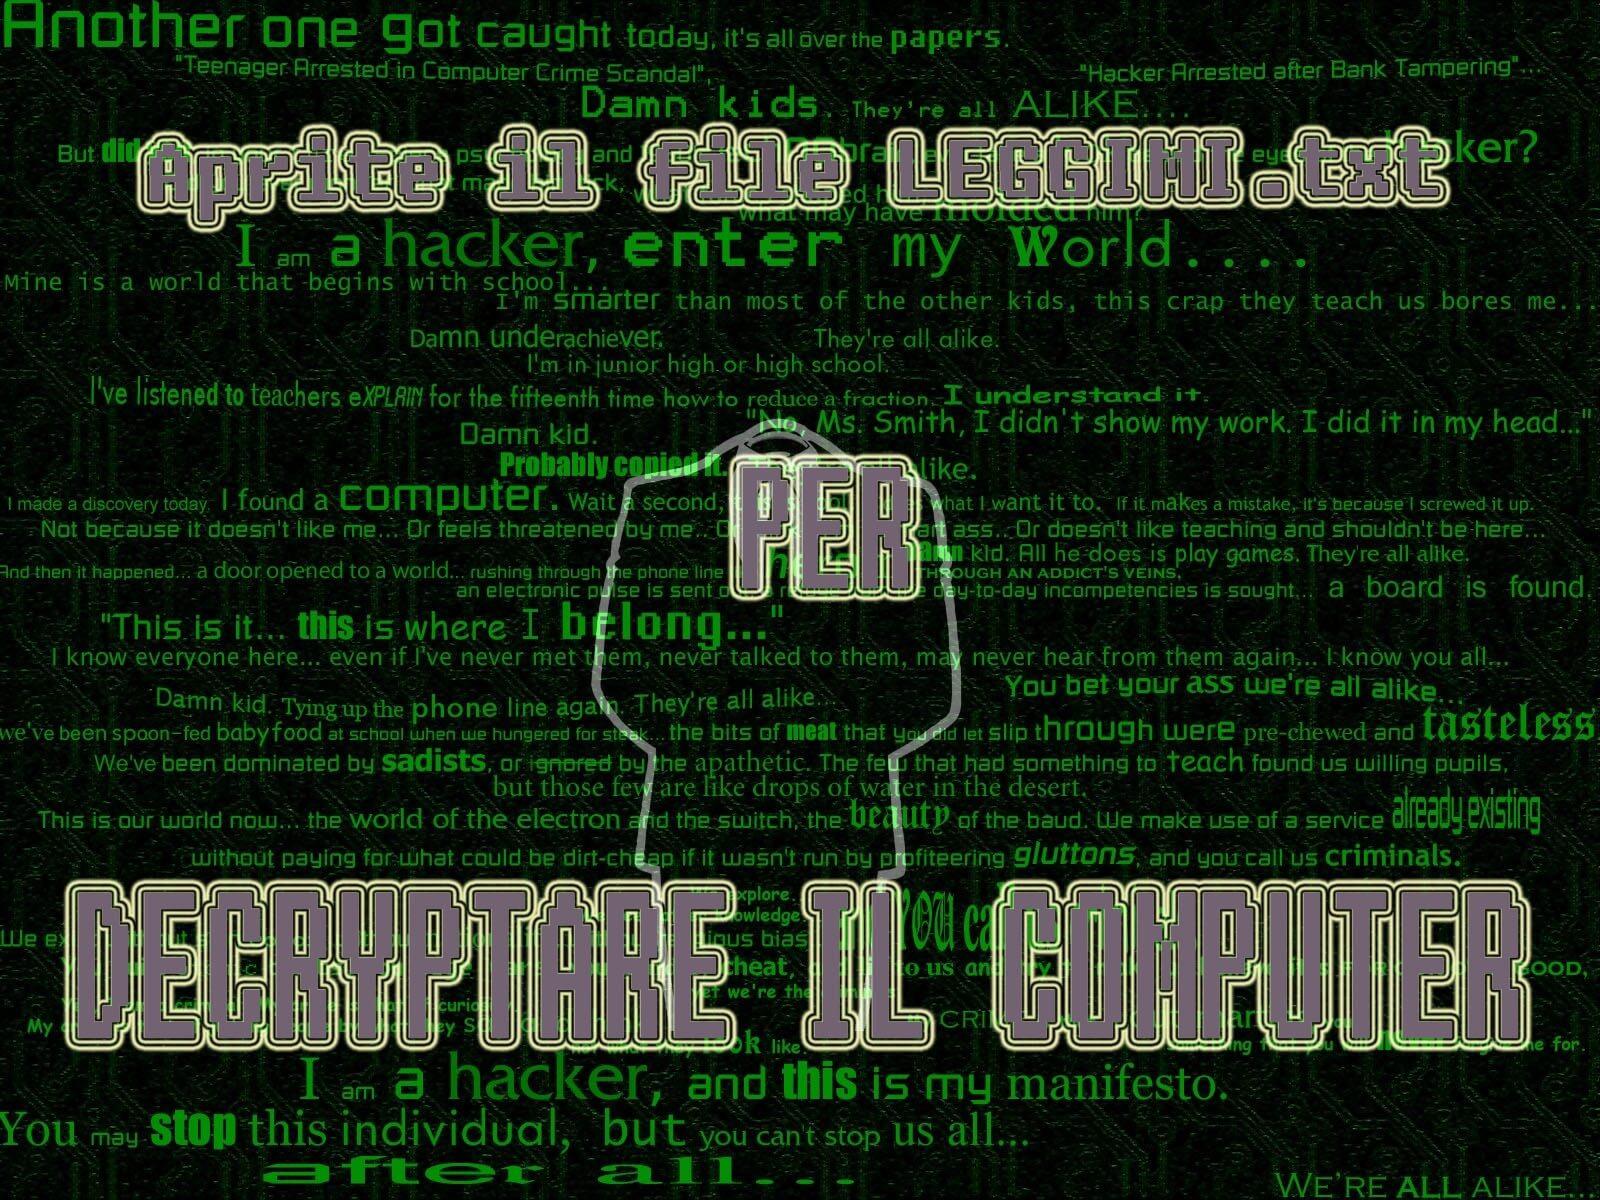 Crypt888 v4 勒索軟體螢幕截圖